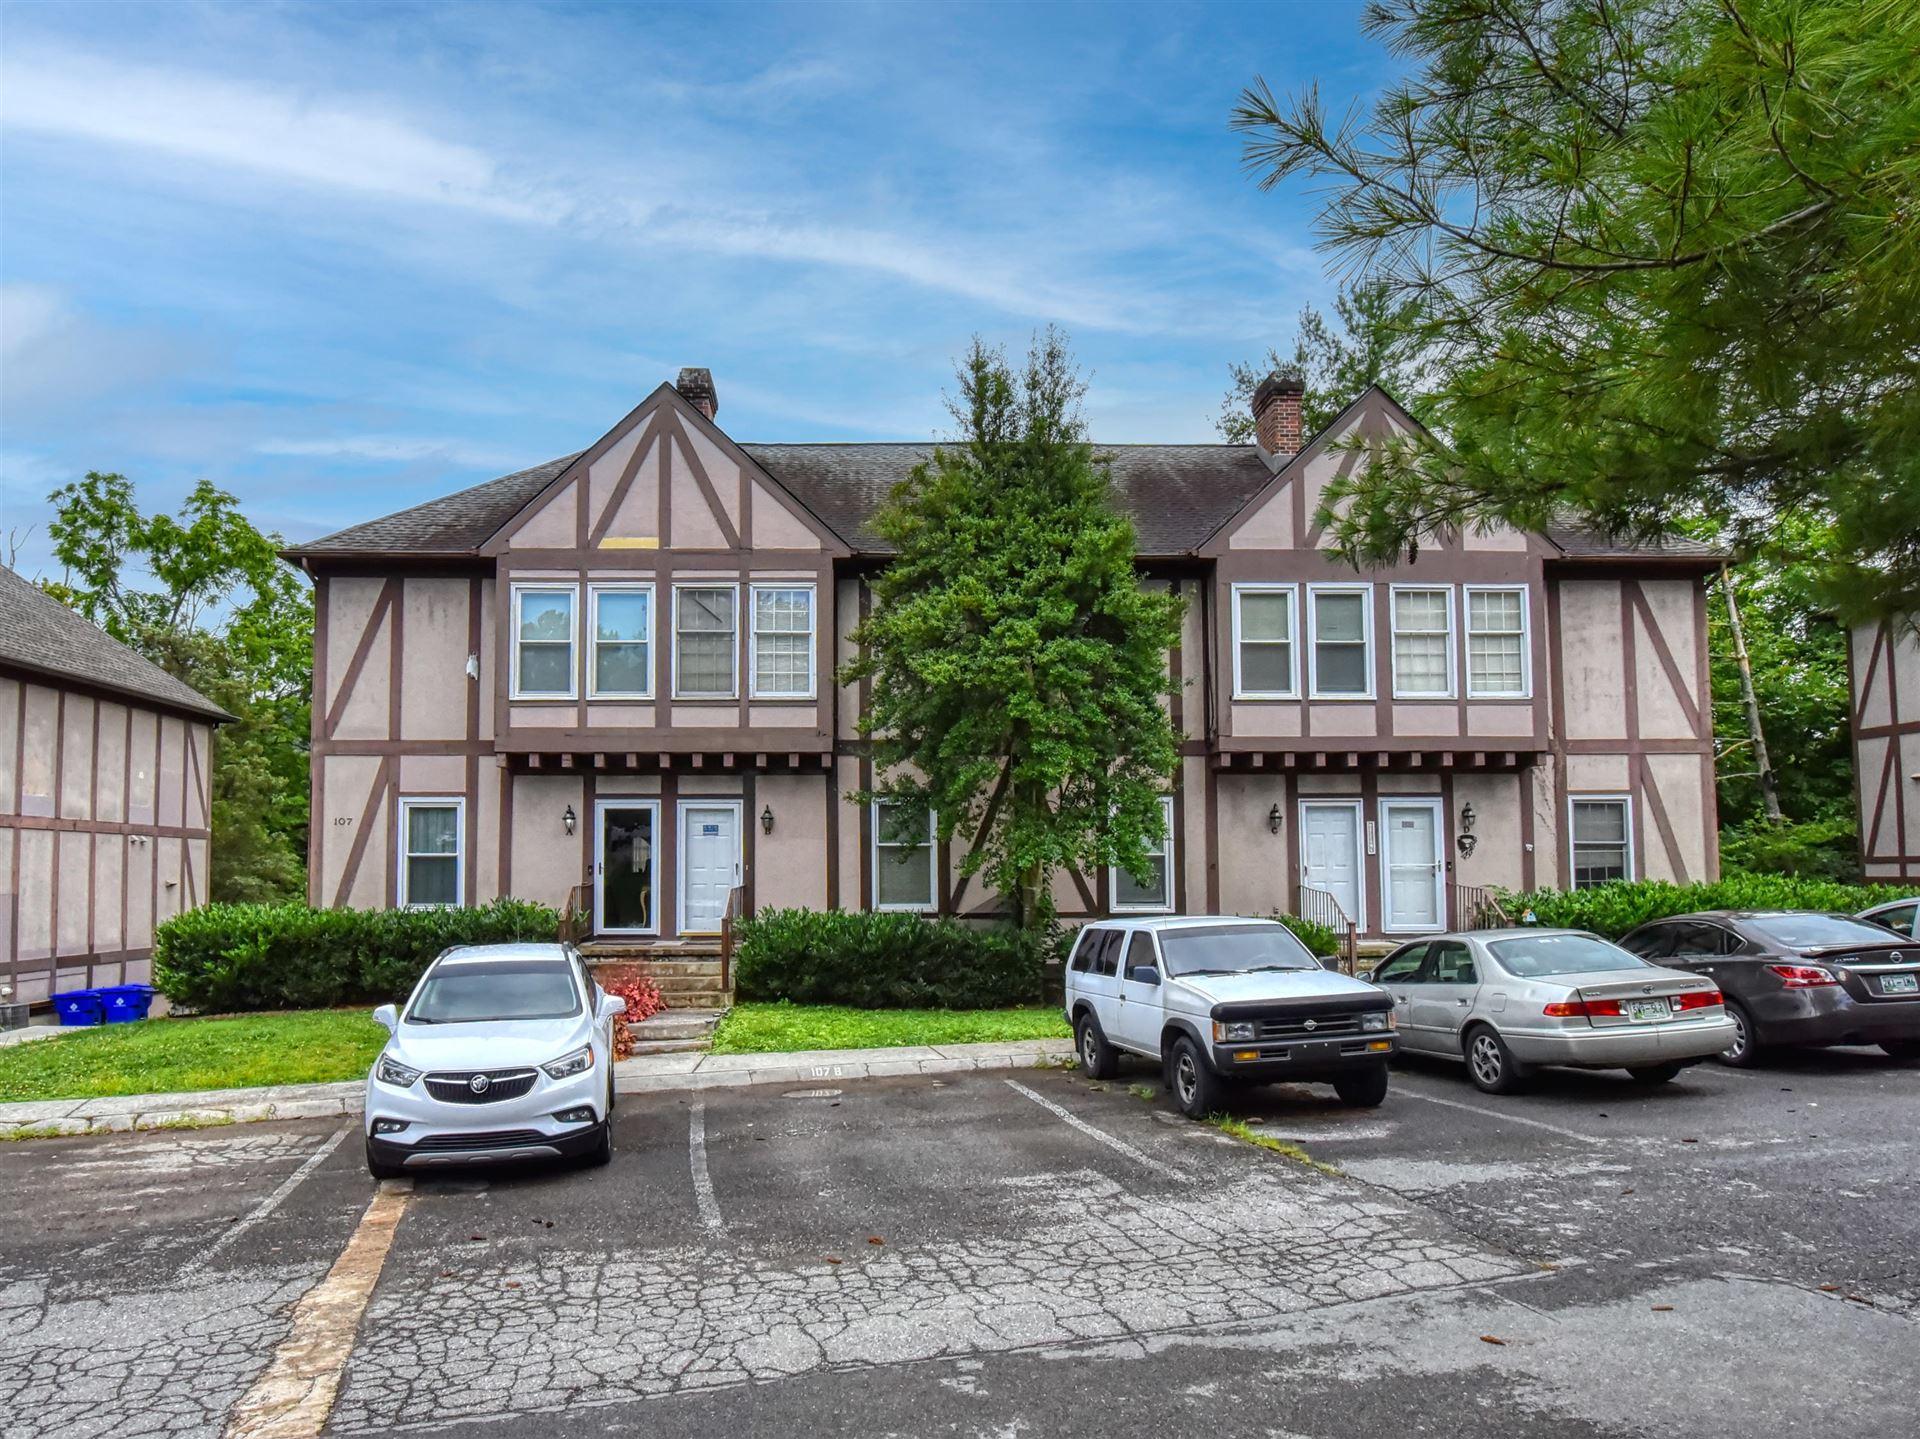 Photo of 107 Arcadia Lane #E, Oak Ridge, TN 37830 (MLS # 1160490)